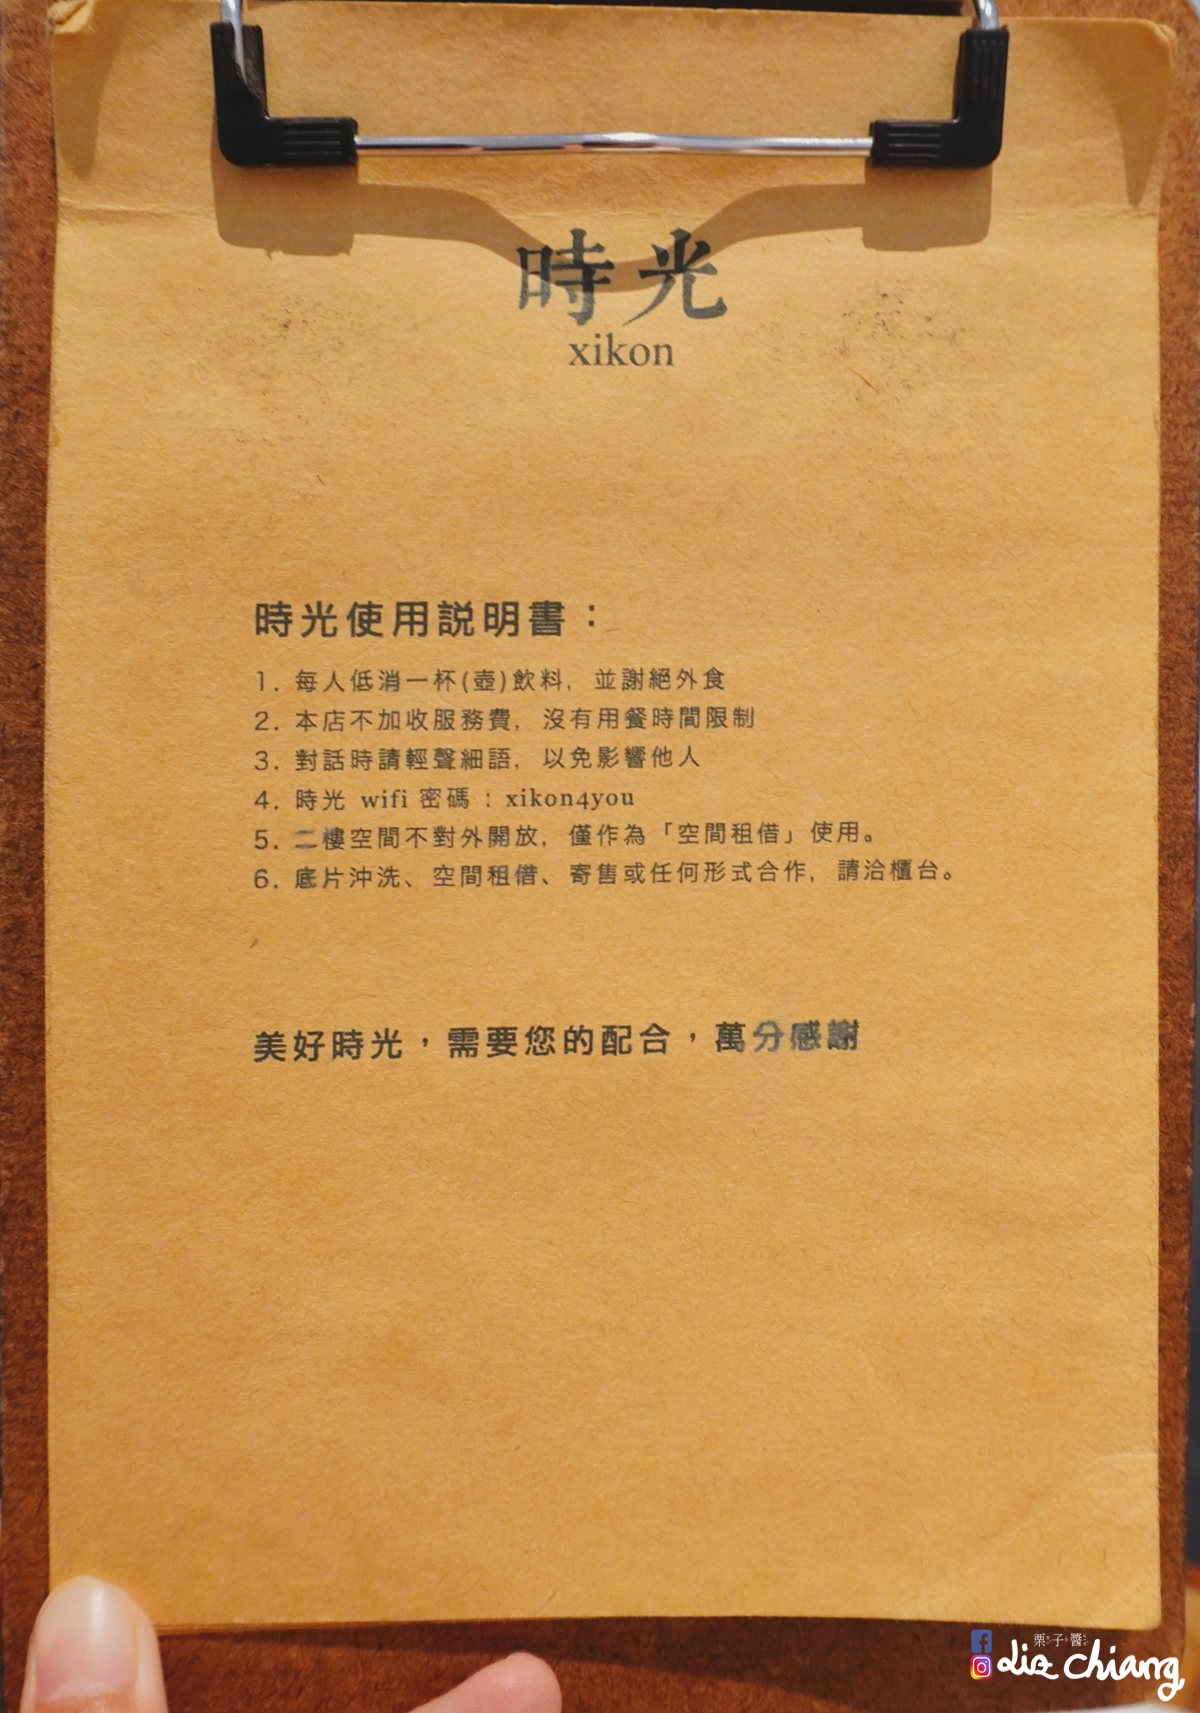 DSC01821Liz chiang 栗子醬-美食部落客-料理部落客